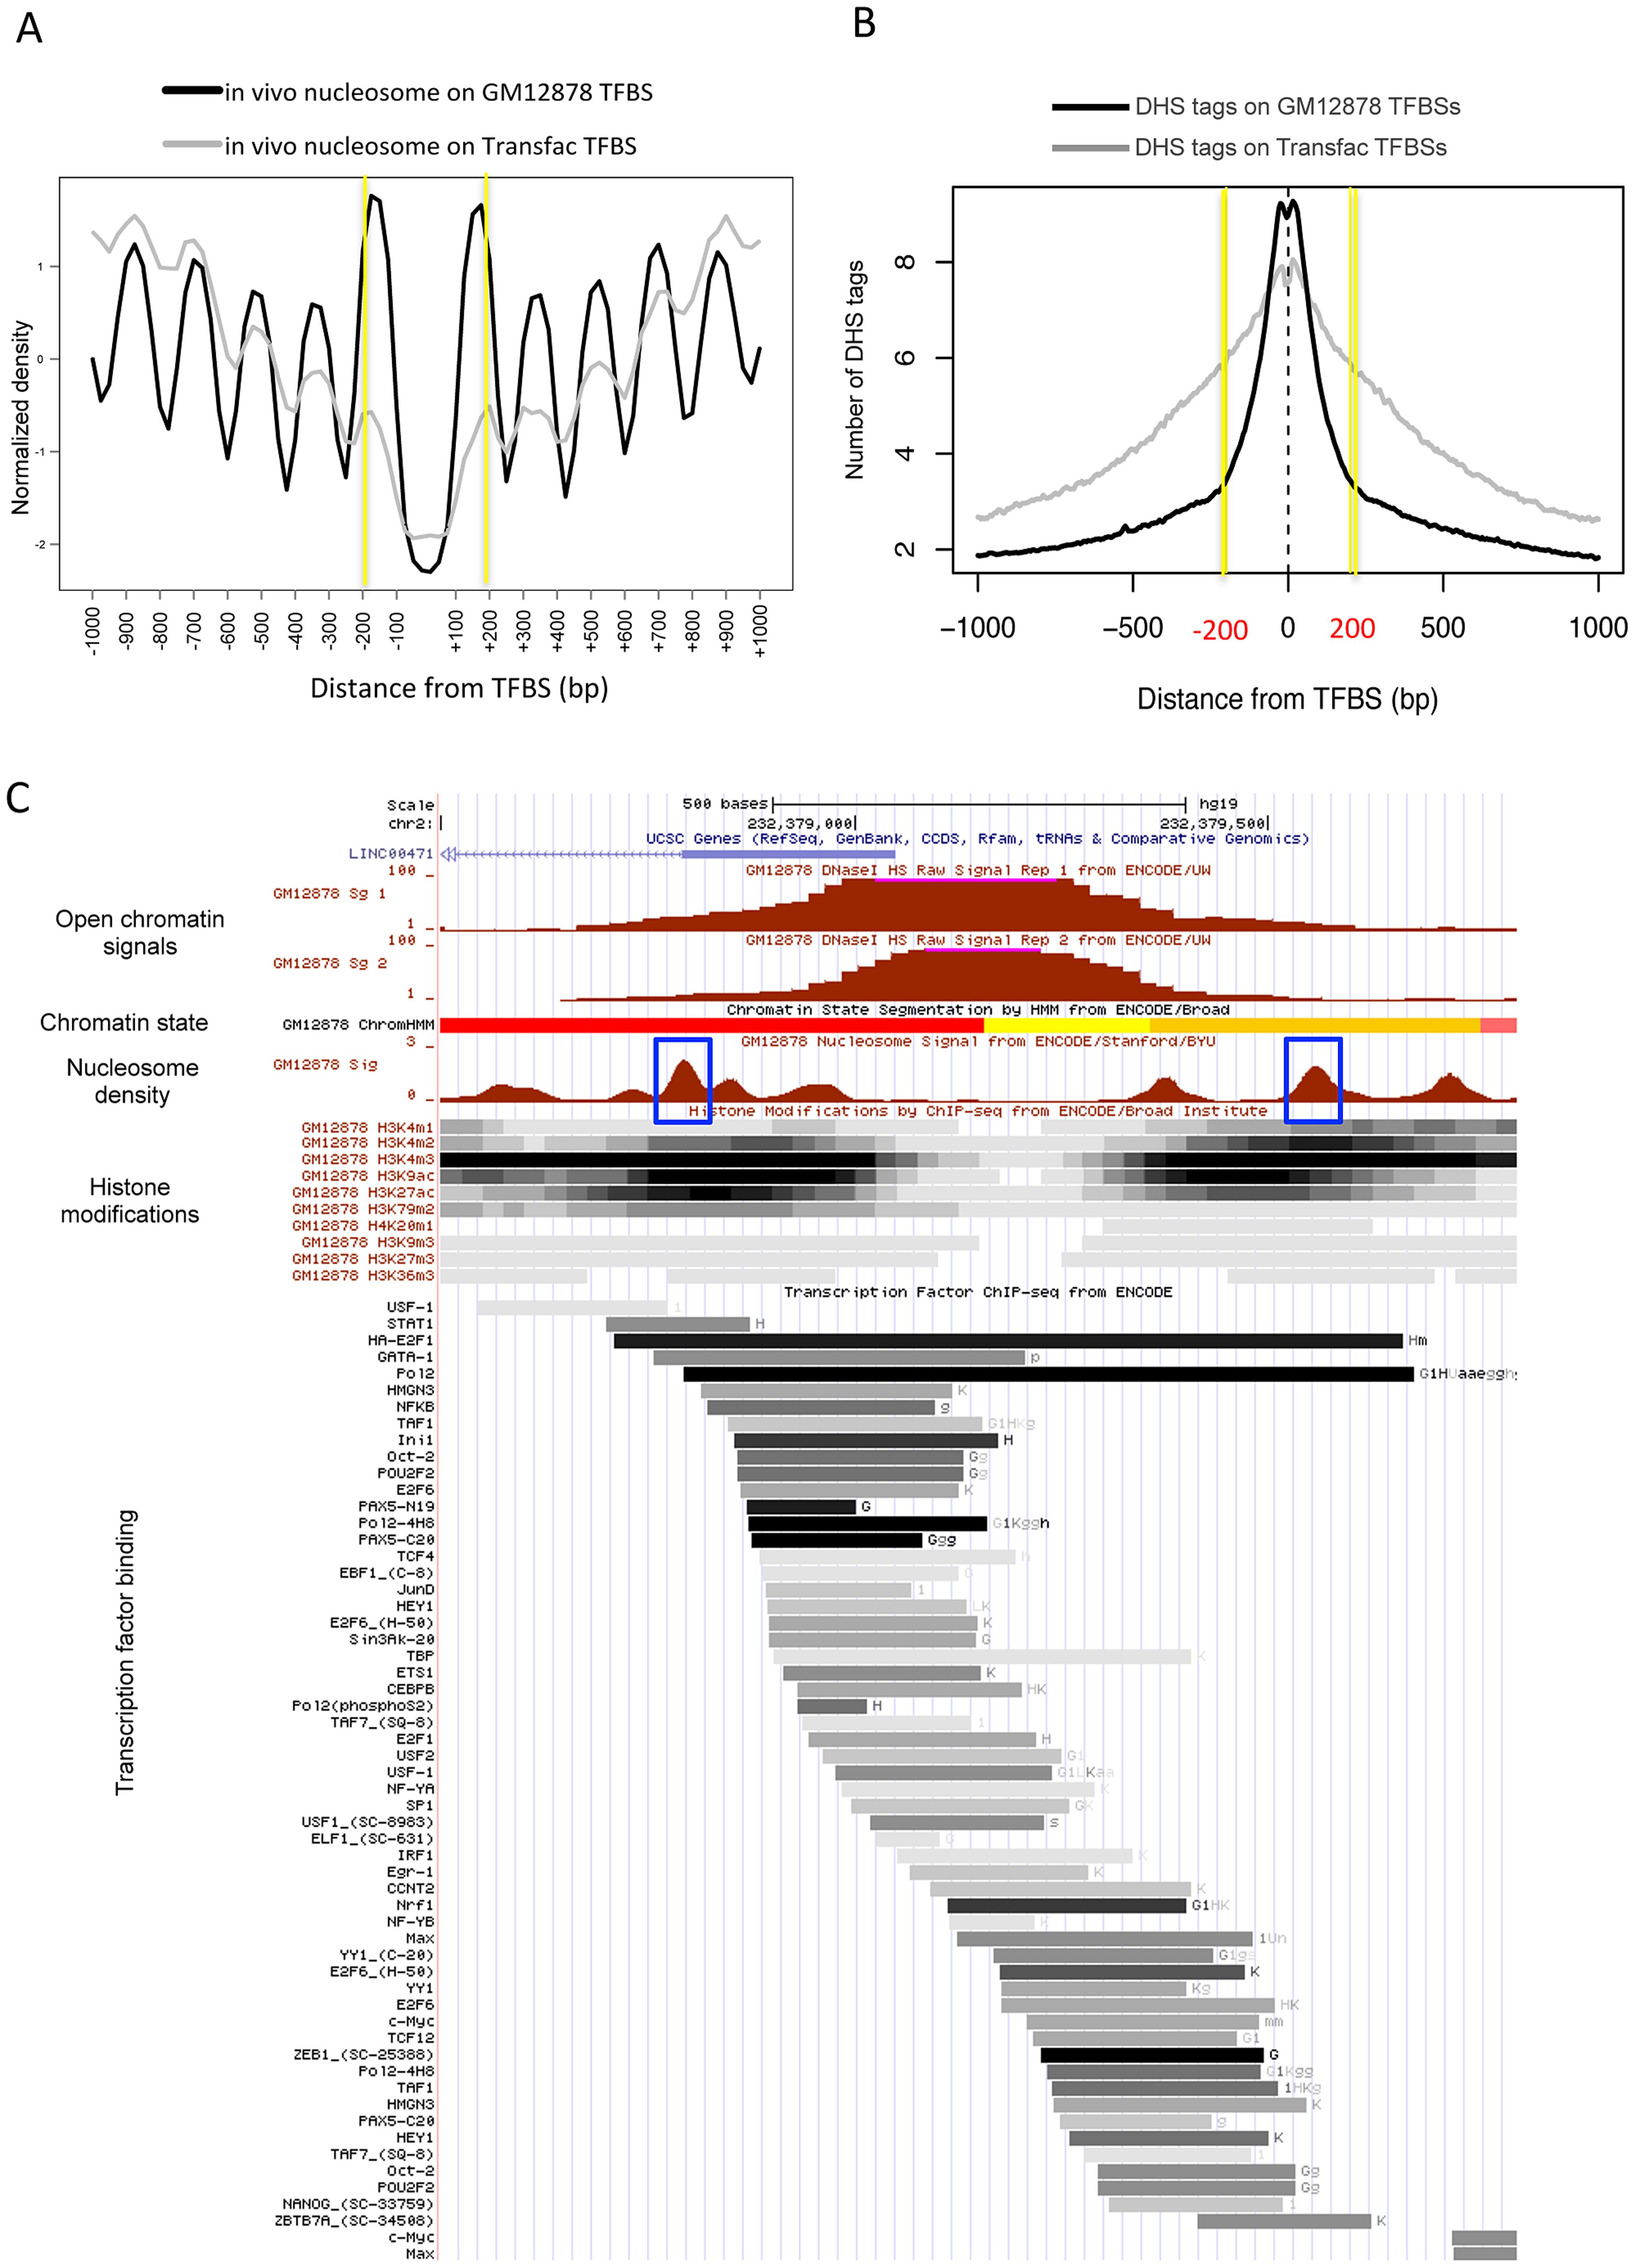 Boundary nucleosome positioning within open chromatin.